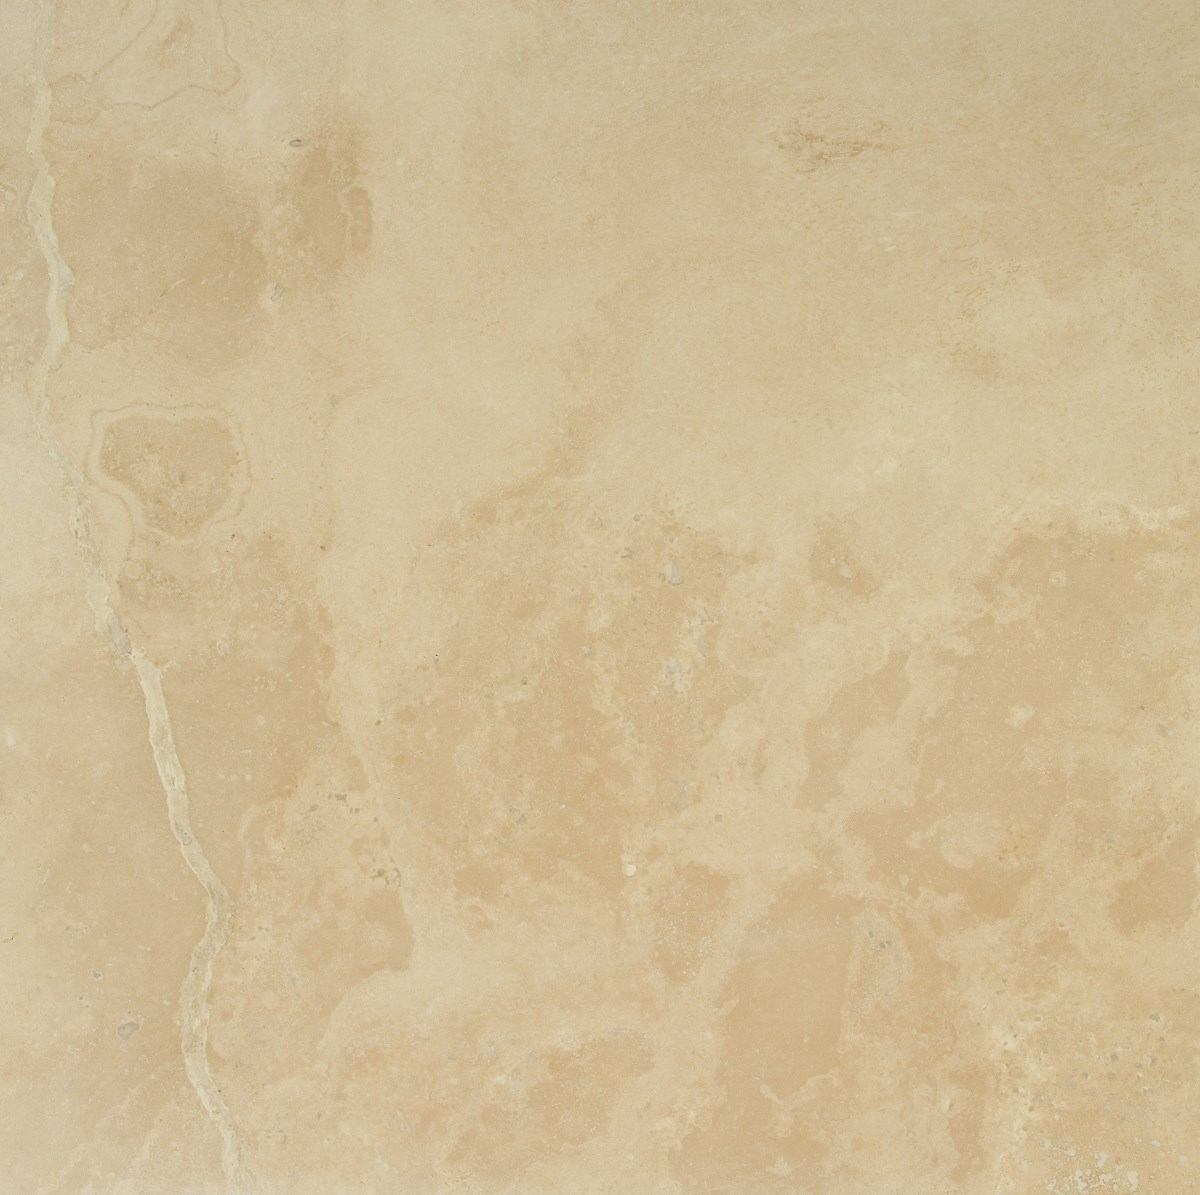 Pisos de marmol travertino veracruz 40x40 290 00 m2 mate for Marmol travertino claro